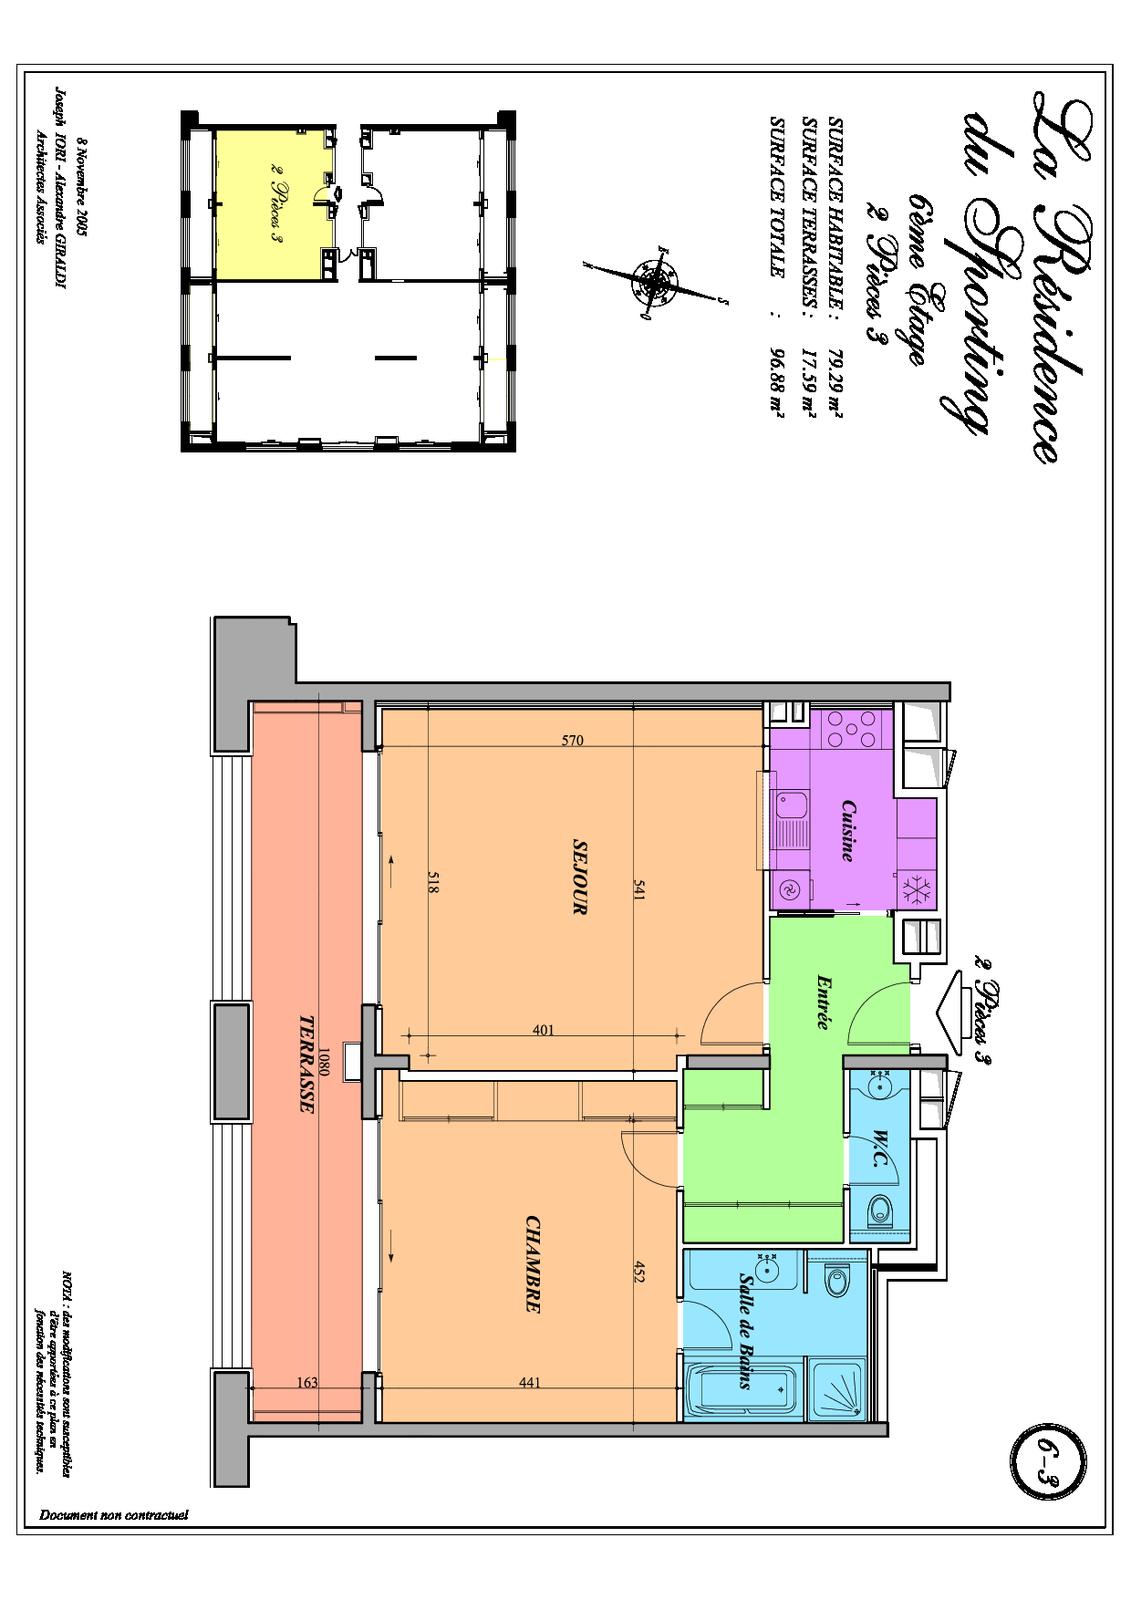 Location r sidence hoteli re 2 pi ces monaco monte carlo for Location residence hoteliere